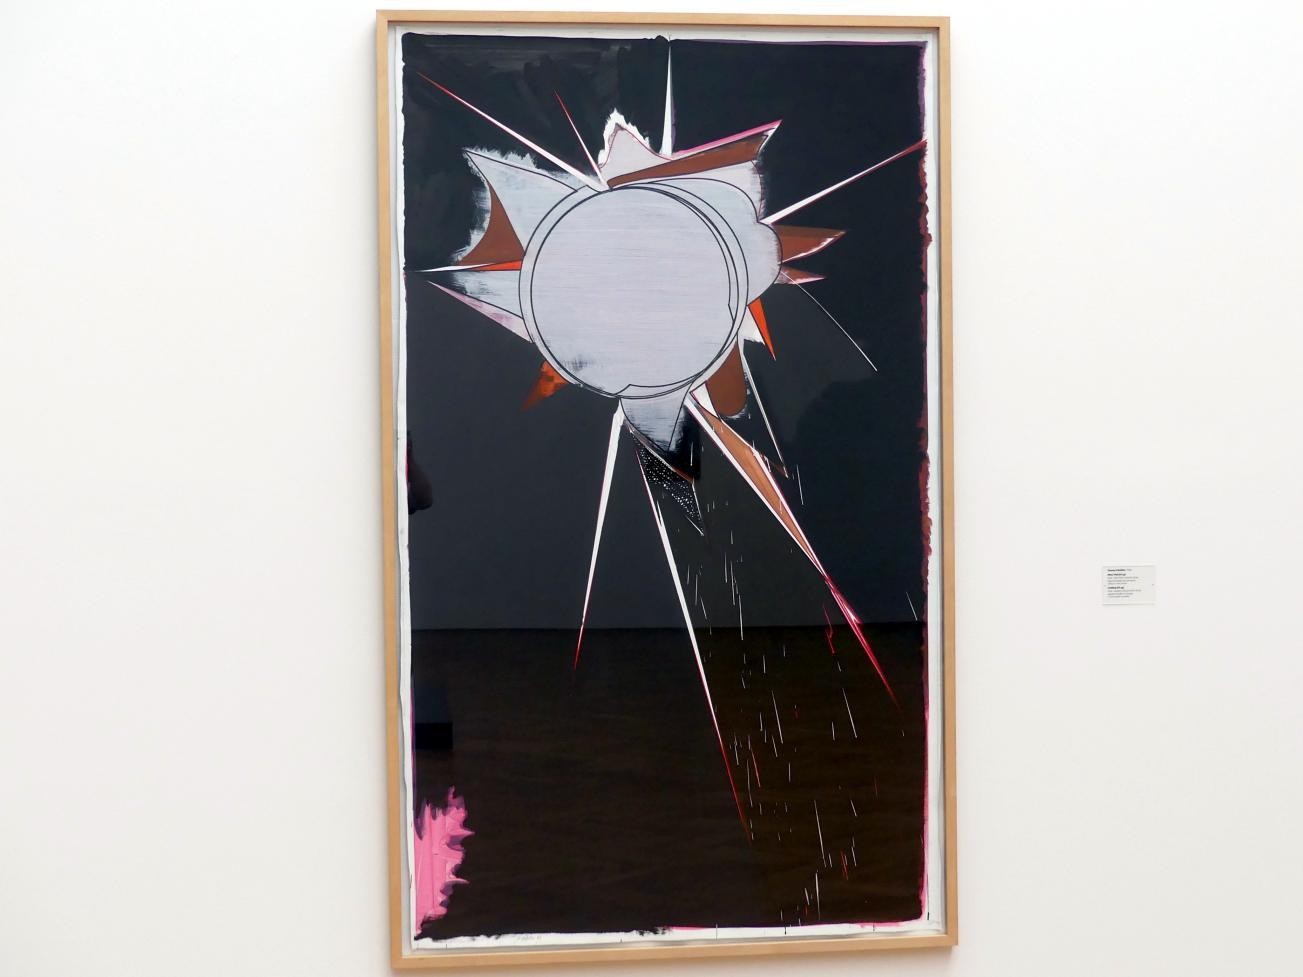 Thomas Scheibitz: Ohne Titel (GP 49), 2003